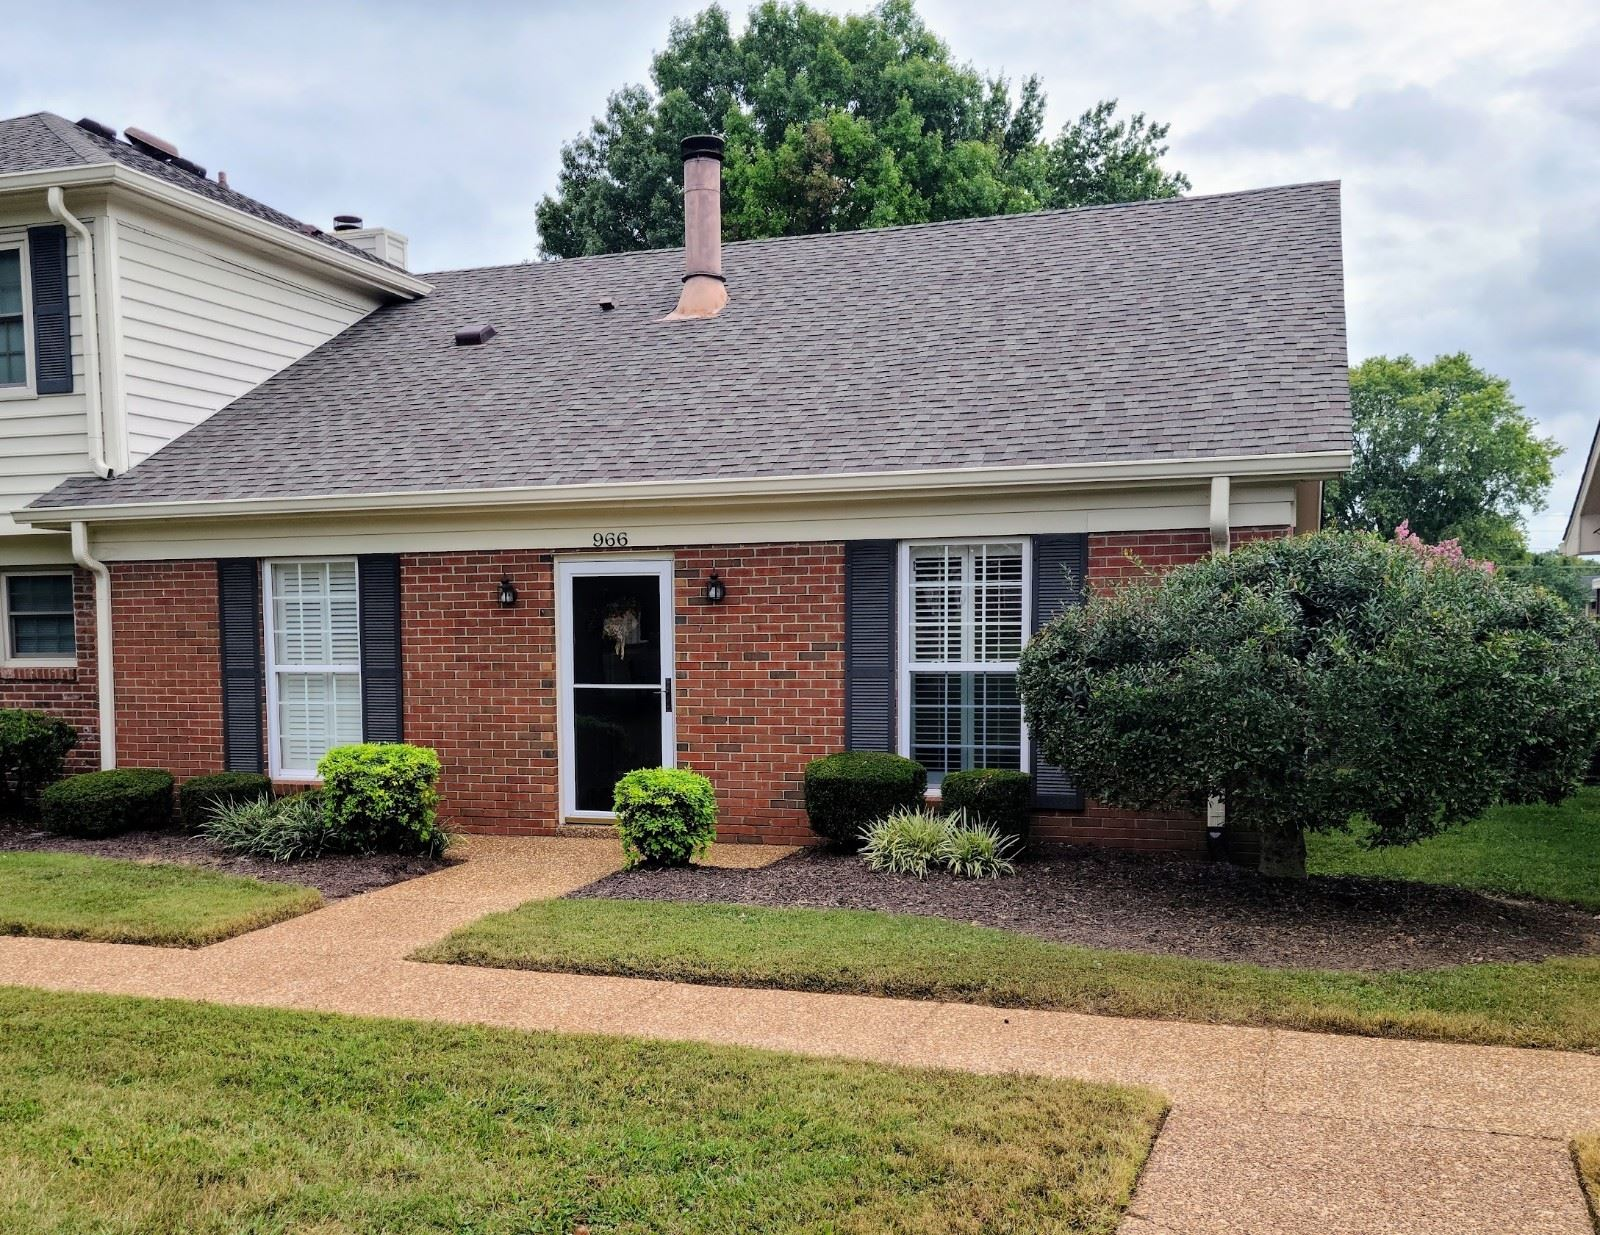 966 E Northfield Blvd, Murfreesboro, TN 37130 - MLS#: 2291308